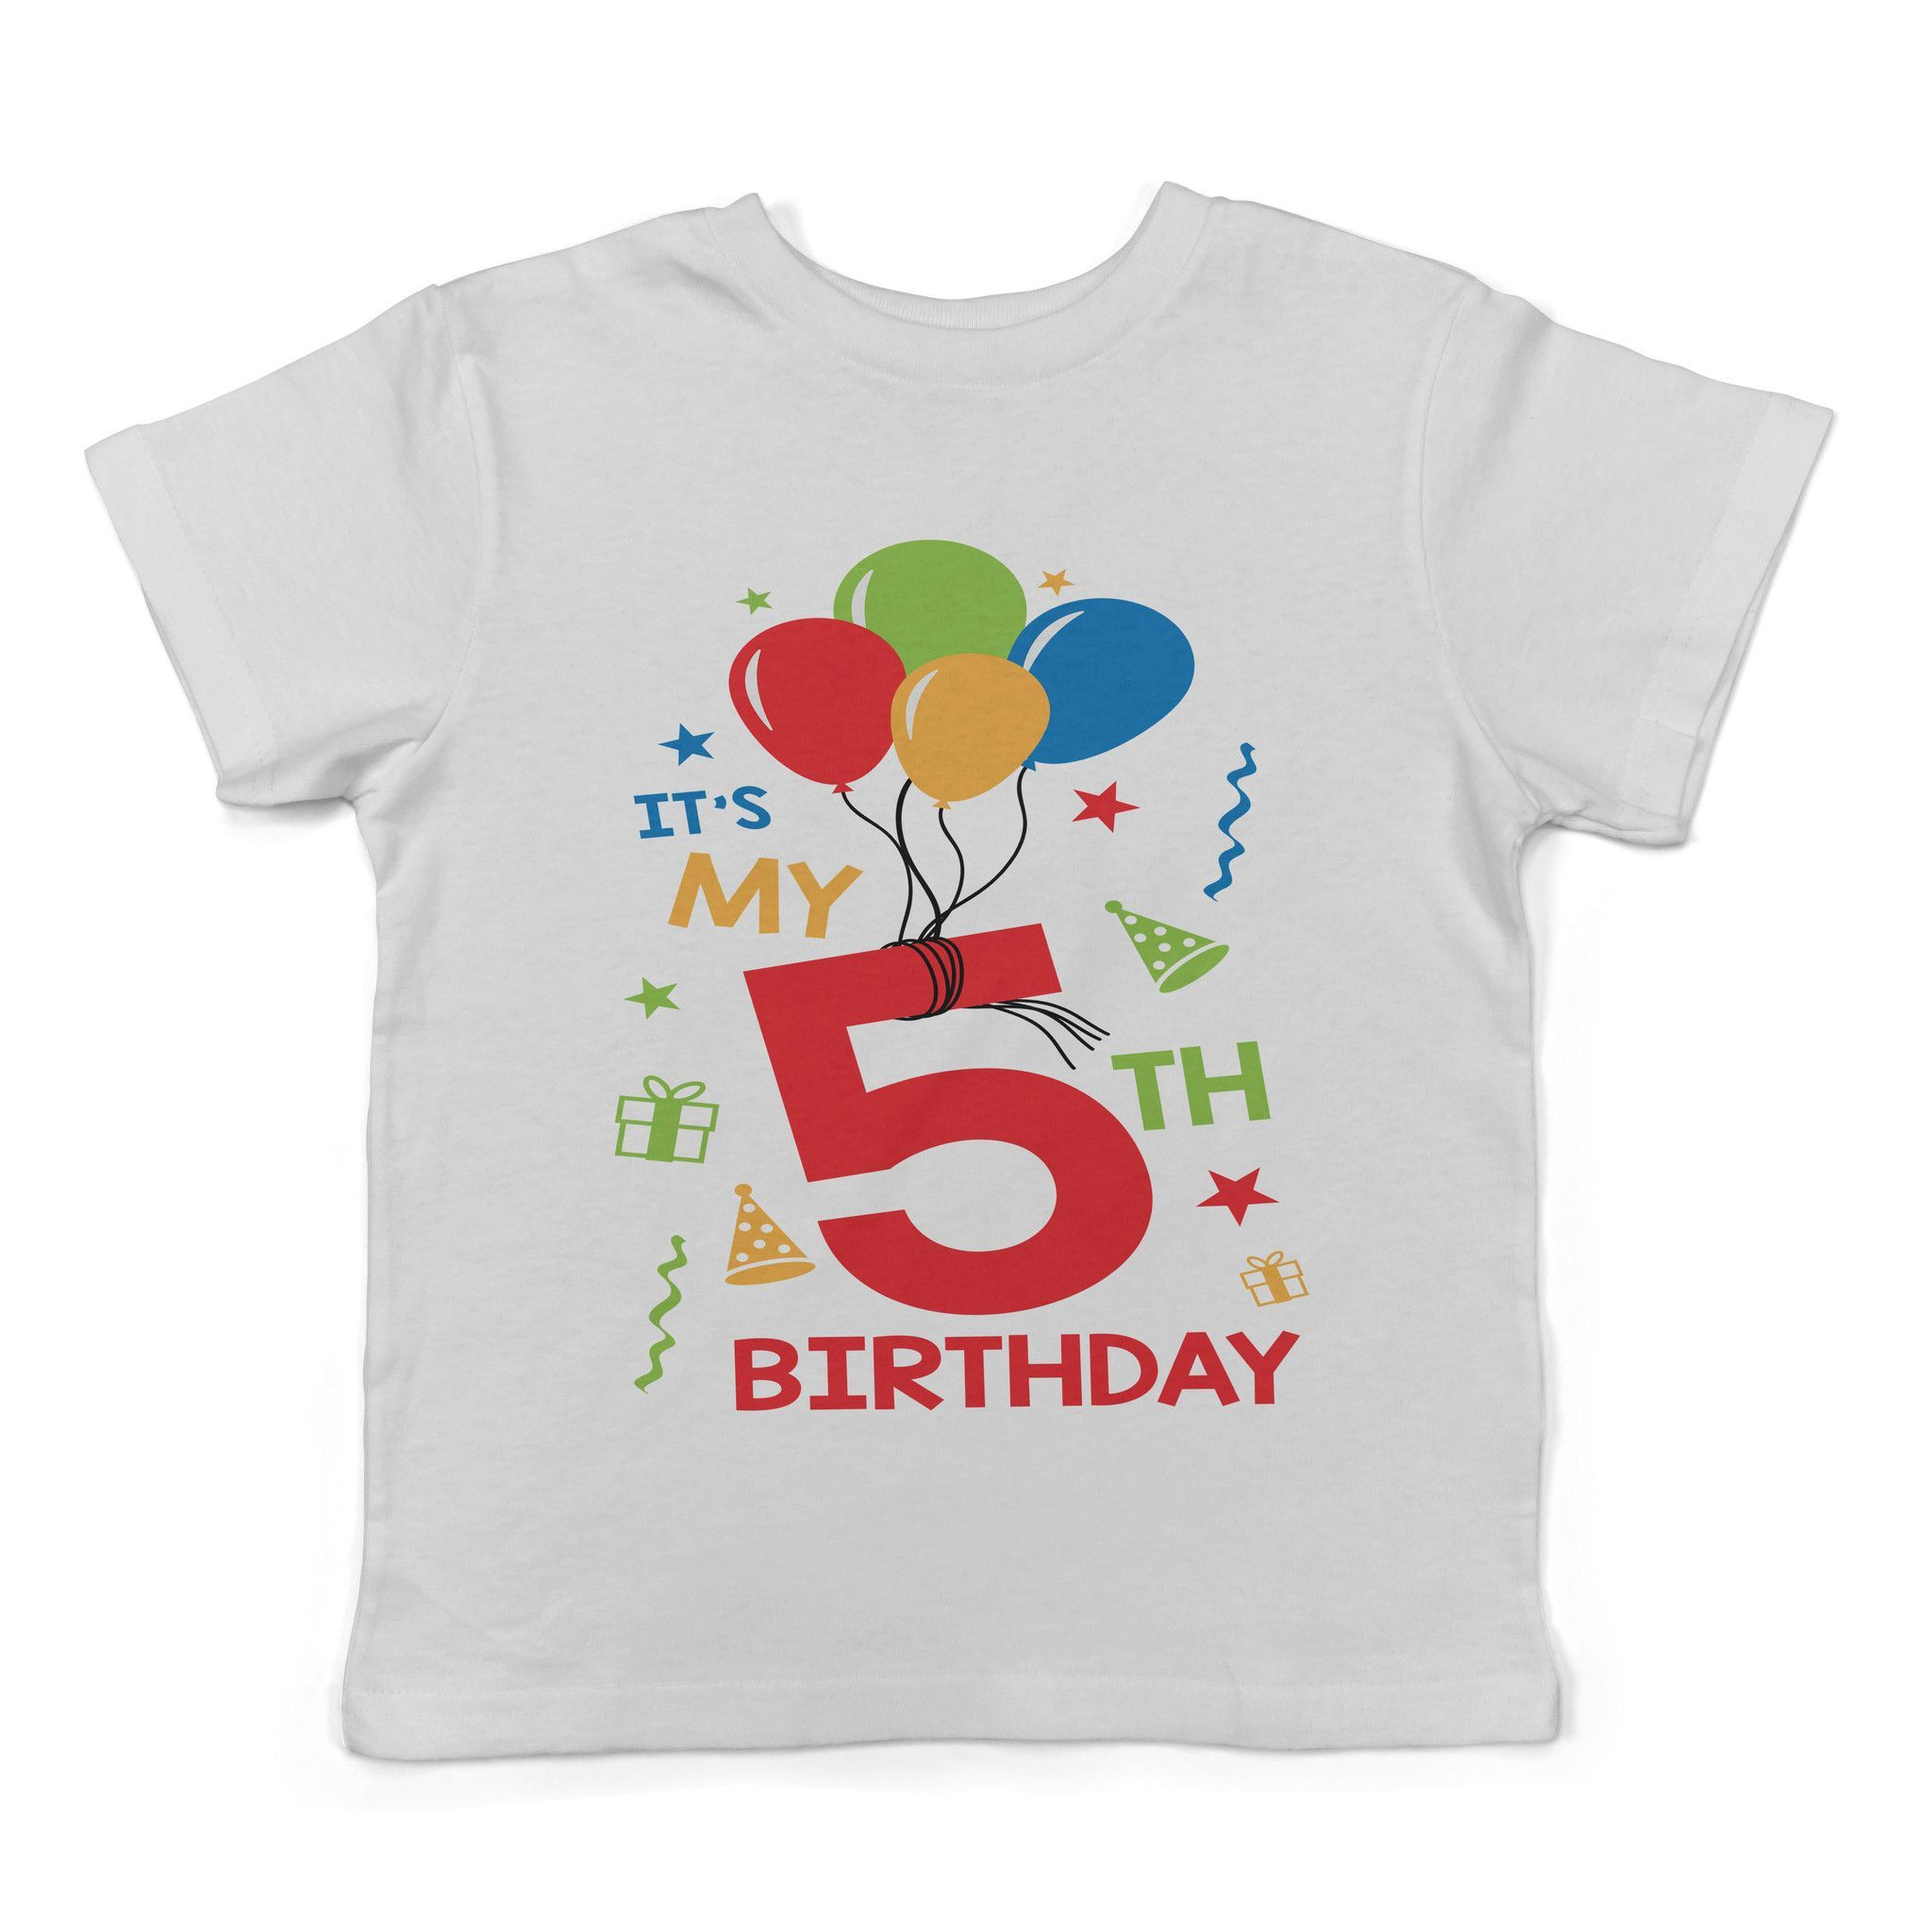 Lil Shirts Its My 5th Birthday Toddler T Shirt